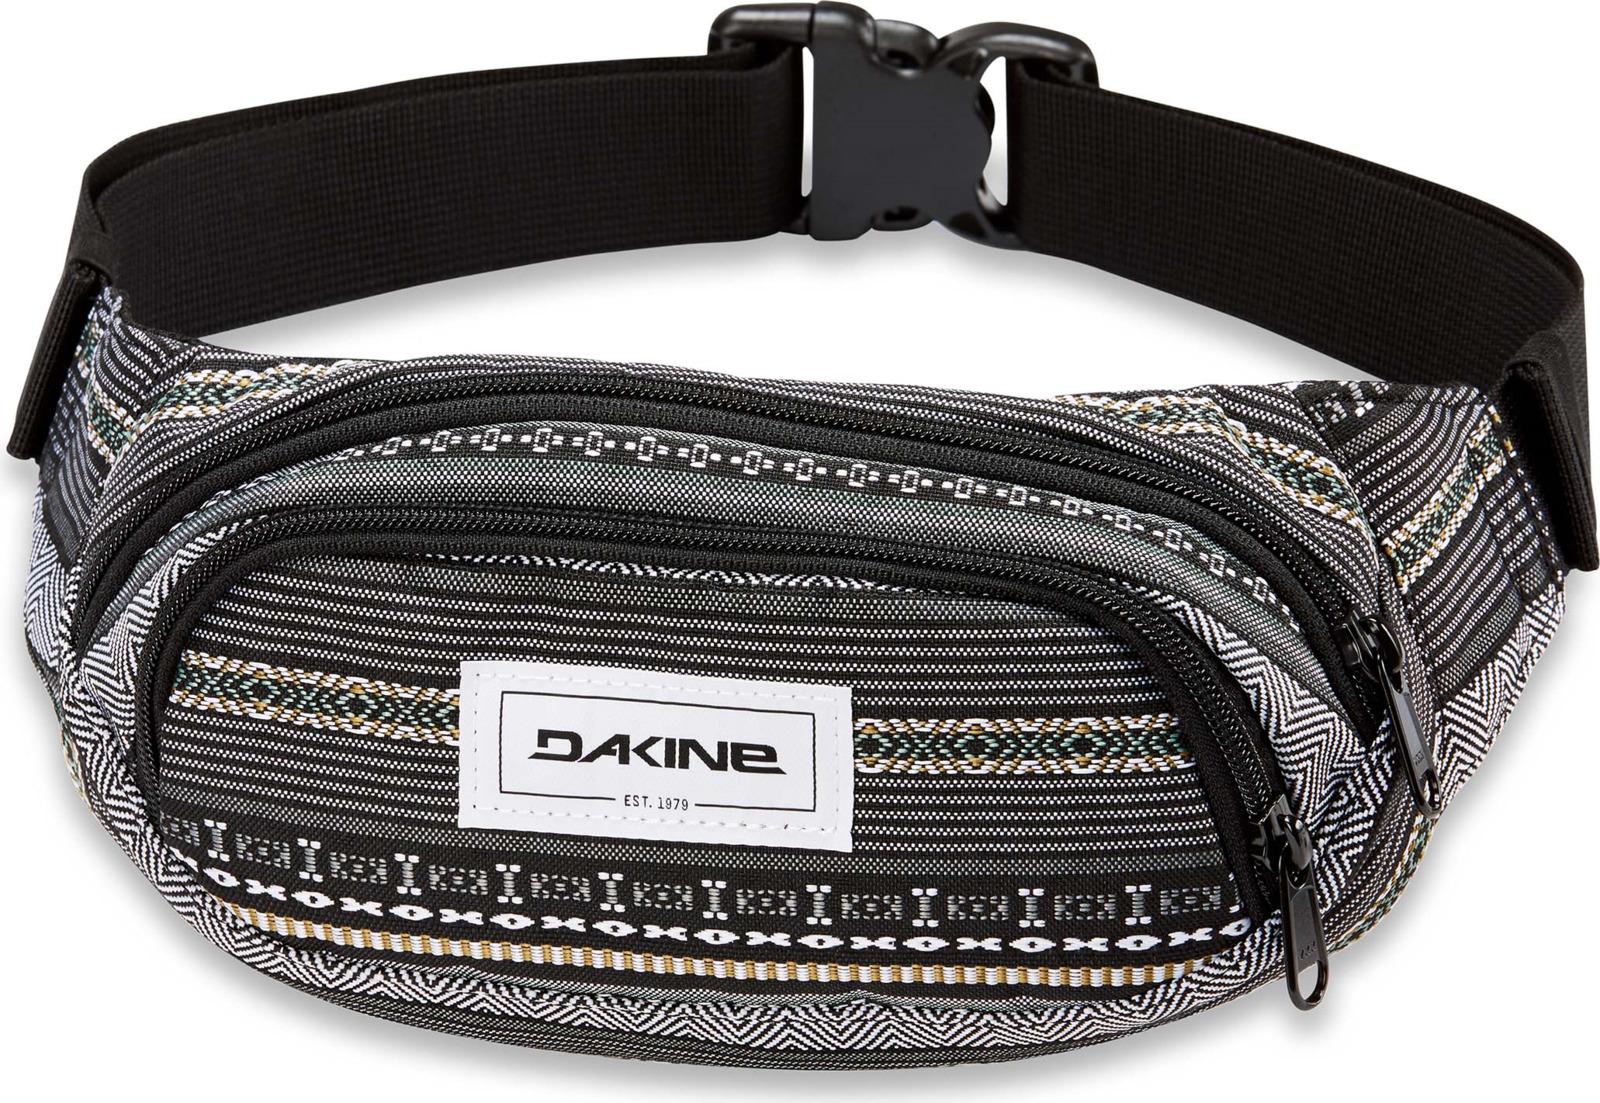 Сумка на пояс Dakine Hip Pack, цвет: черный, 23 х 13 х 8 см рубашка mango man mango man he002embqxw0